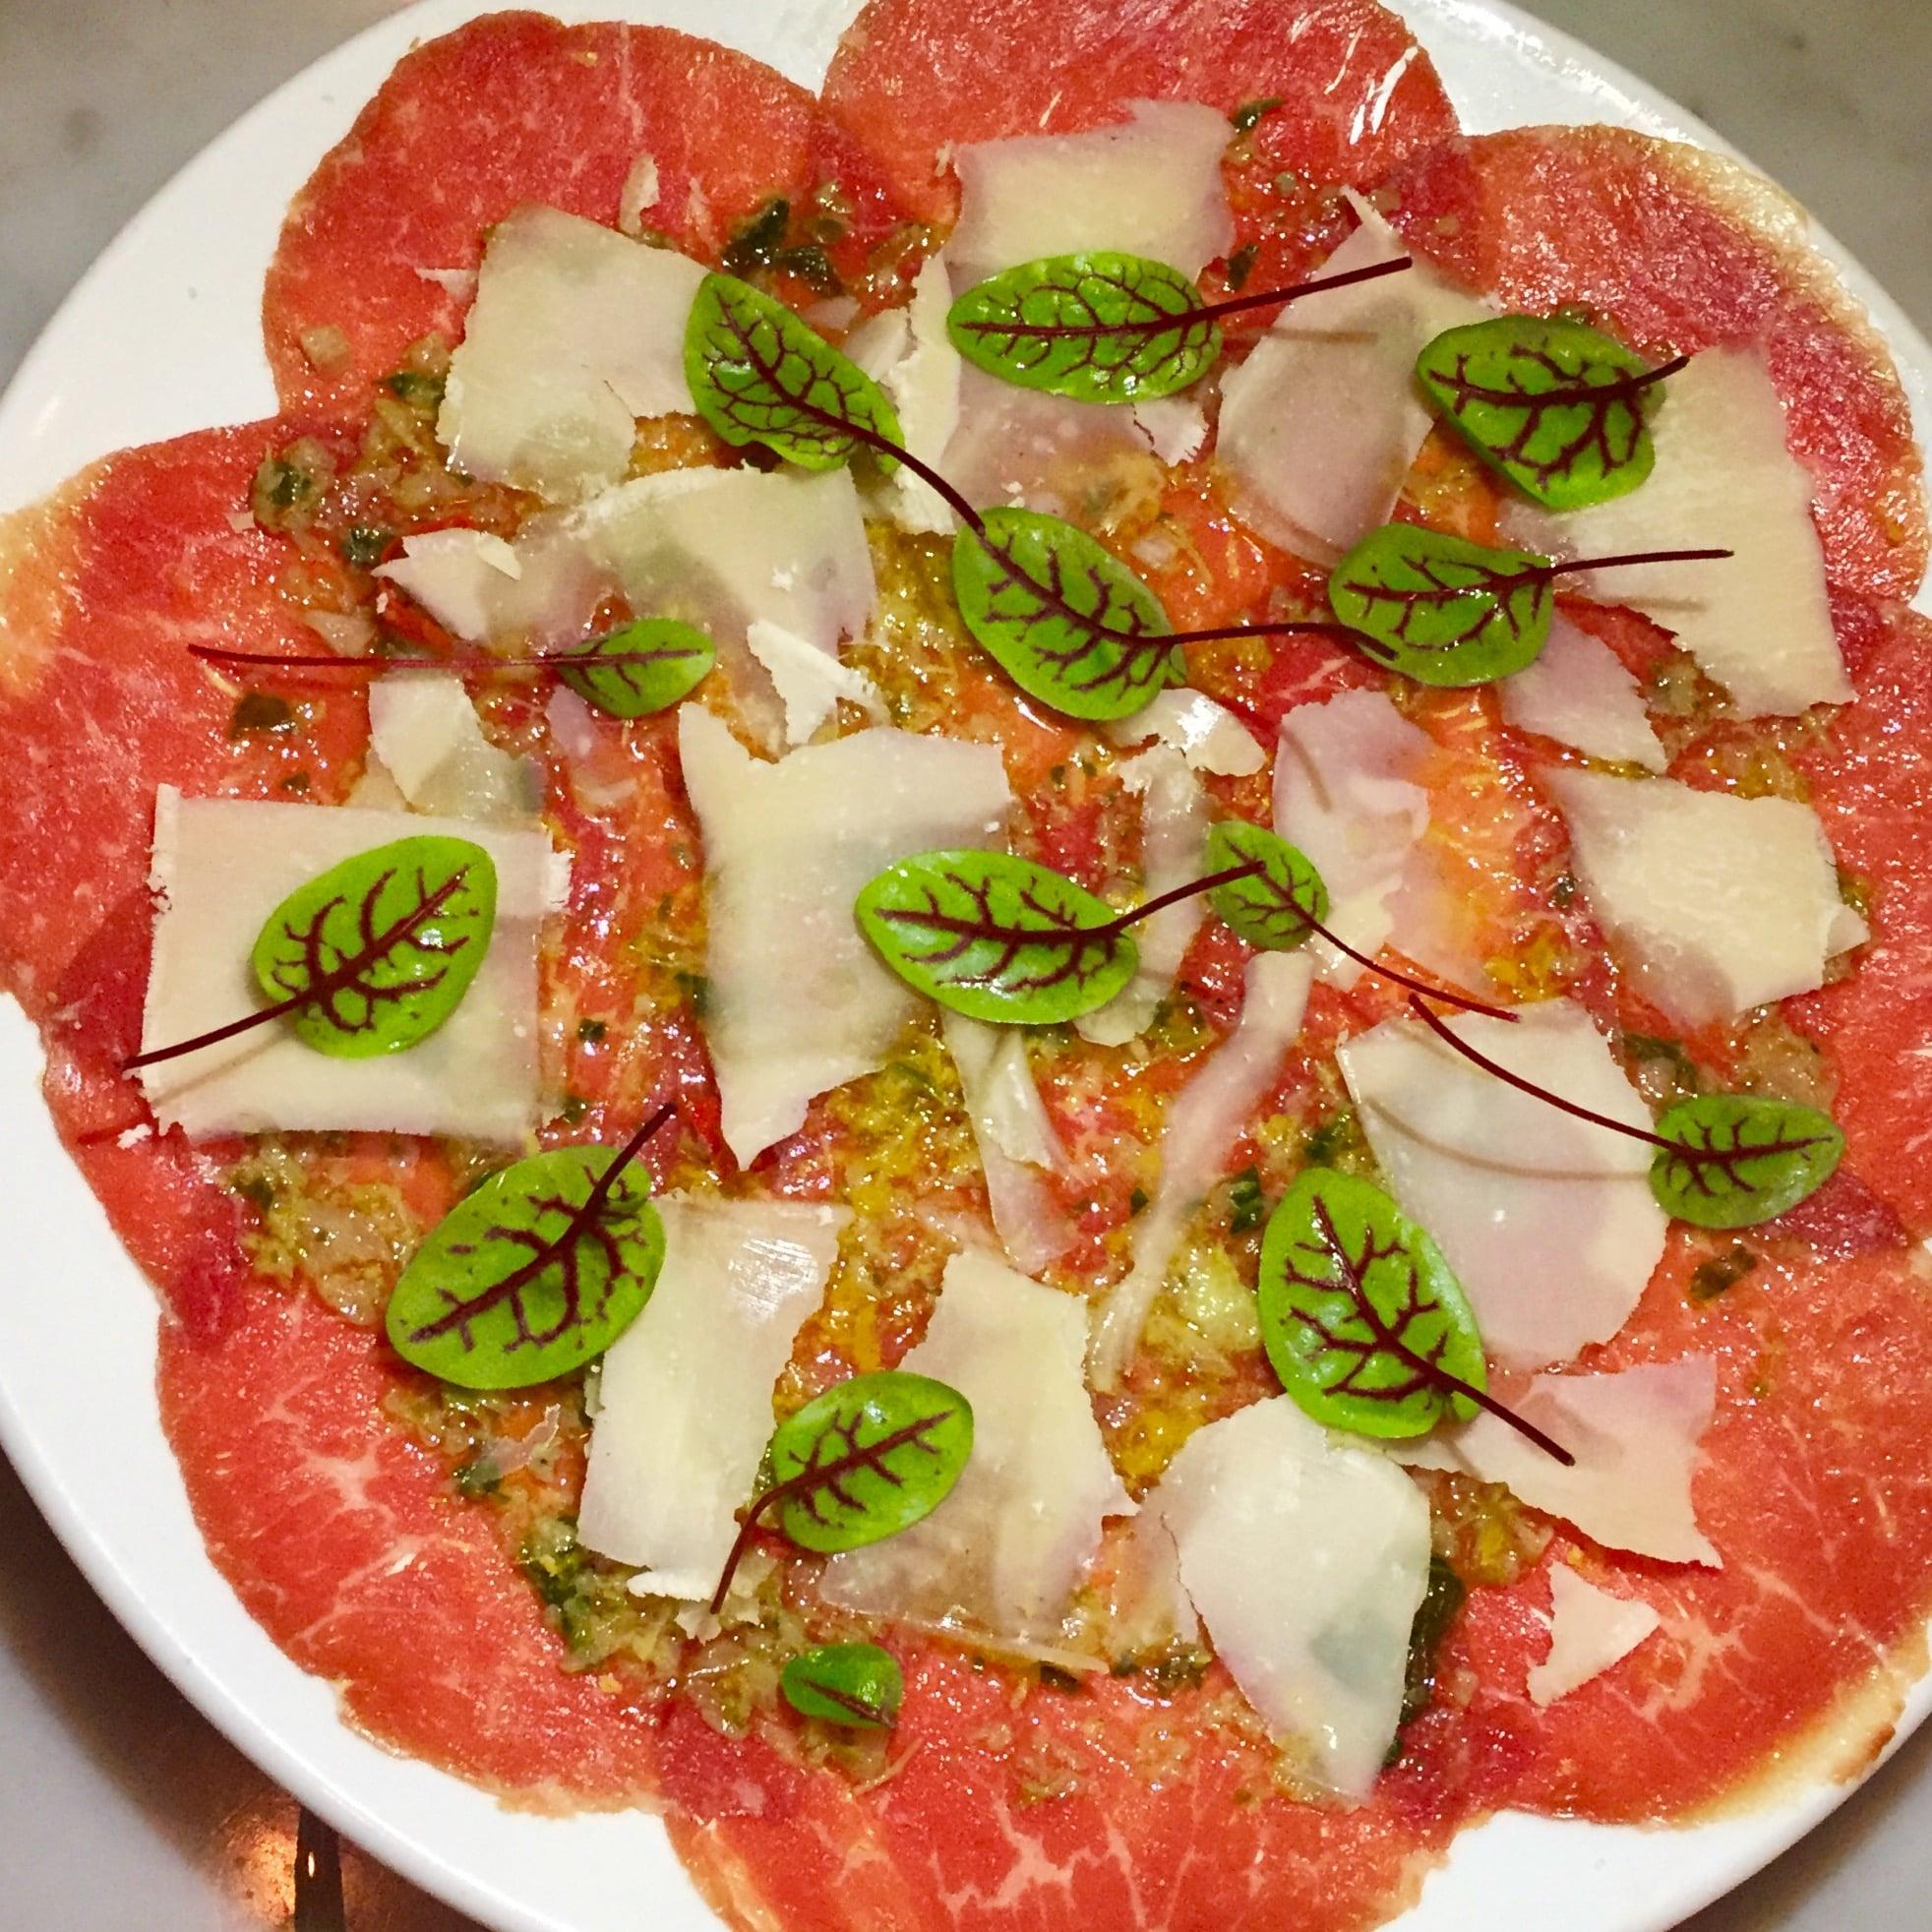 Beef Carpaccio with Celery leaf verde and Parmigiano shavings.